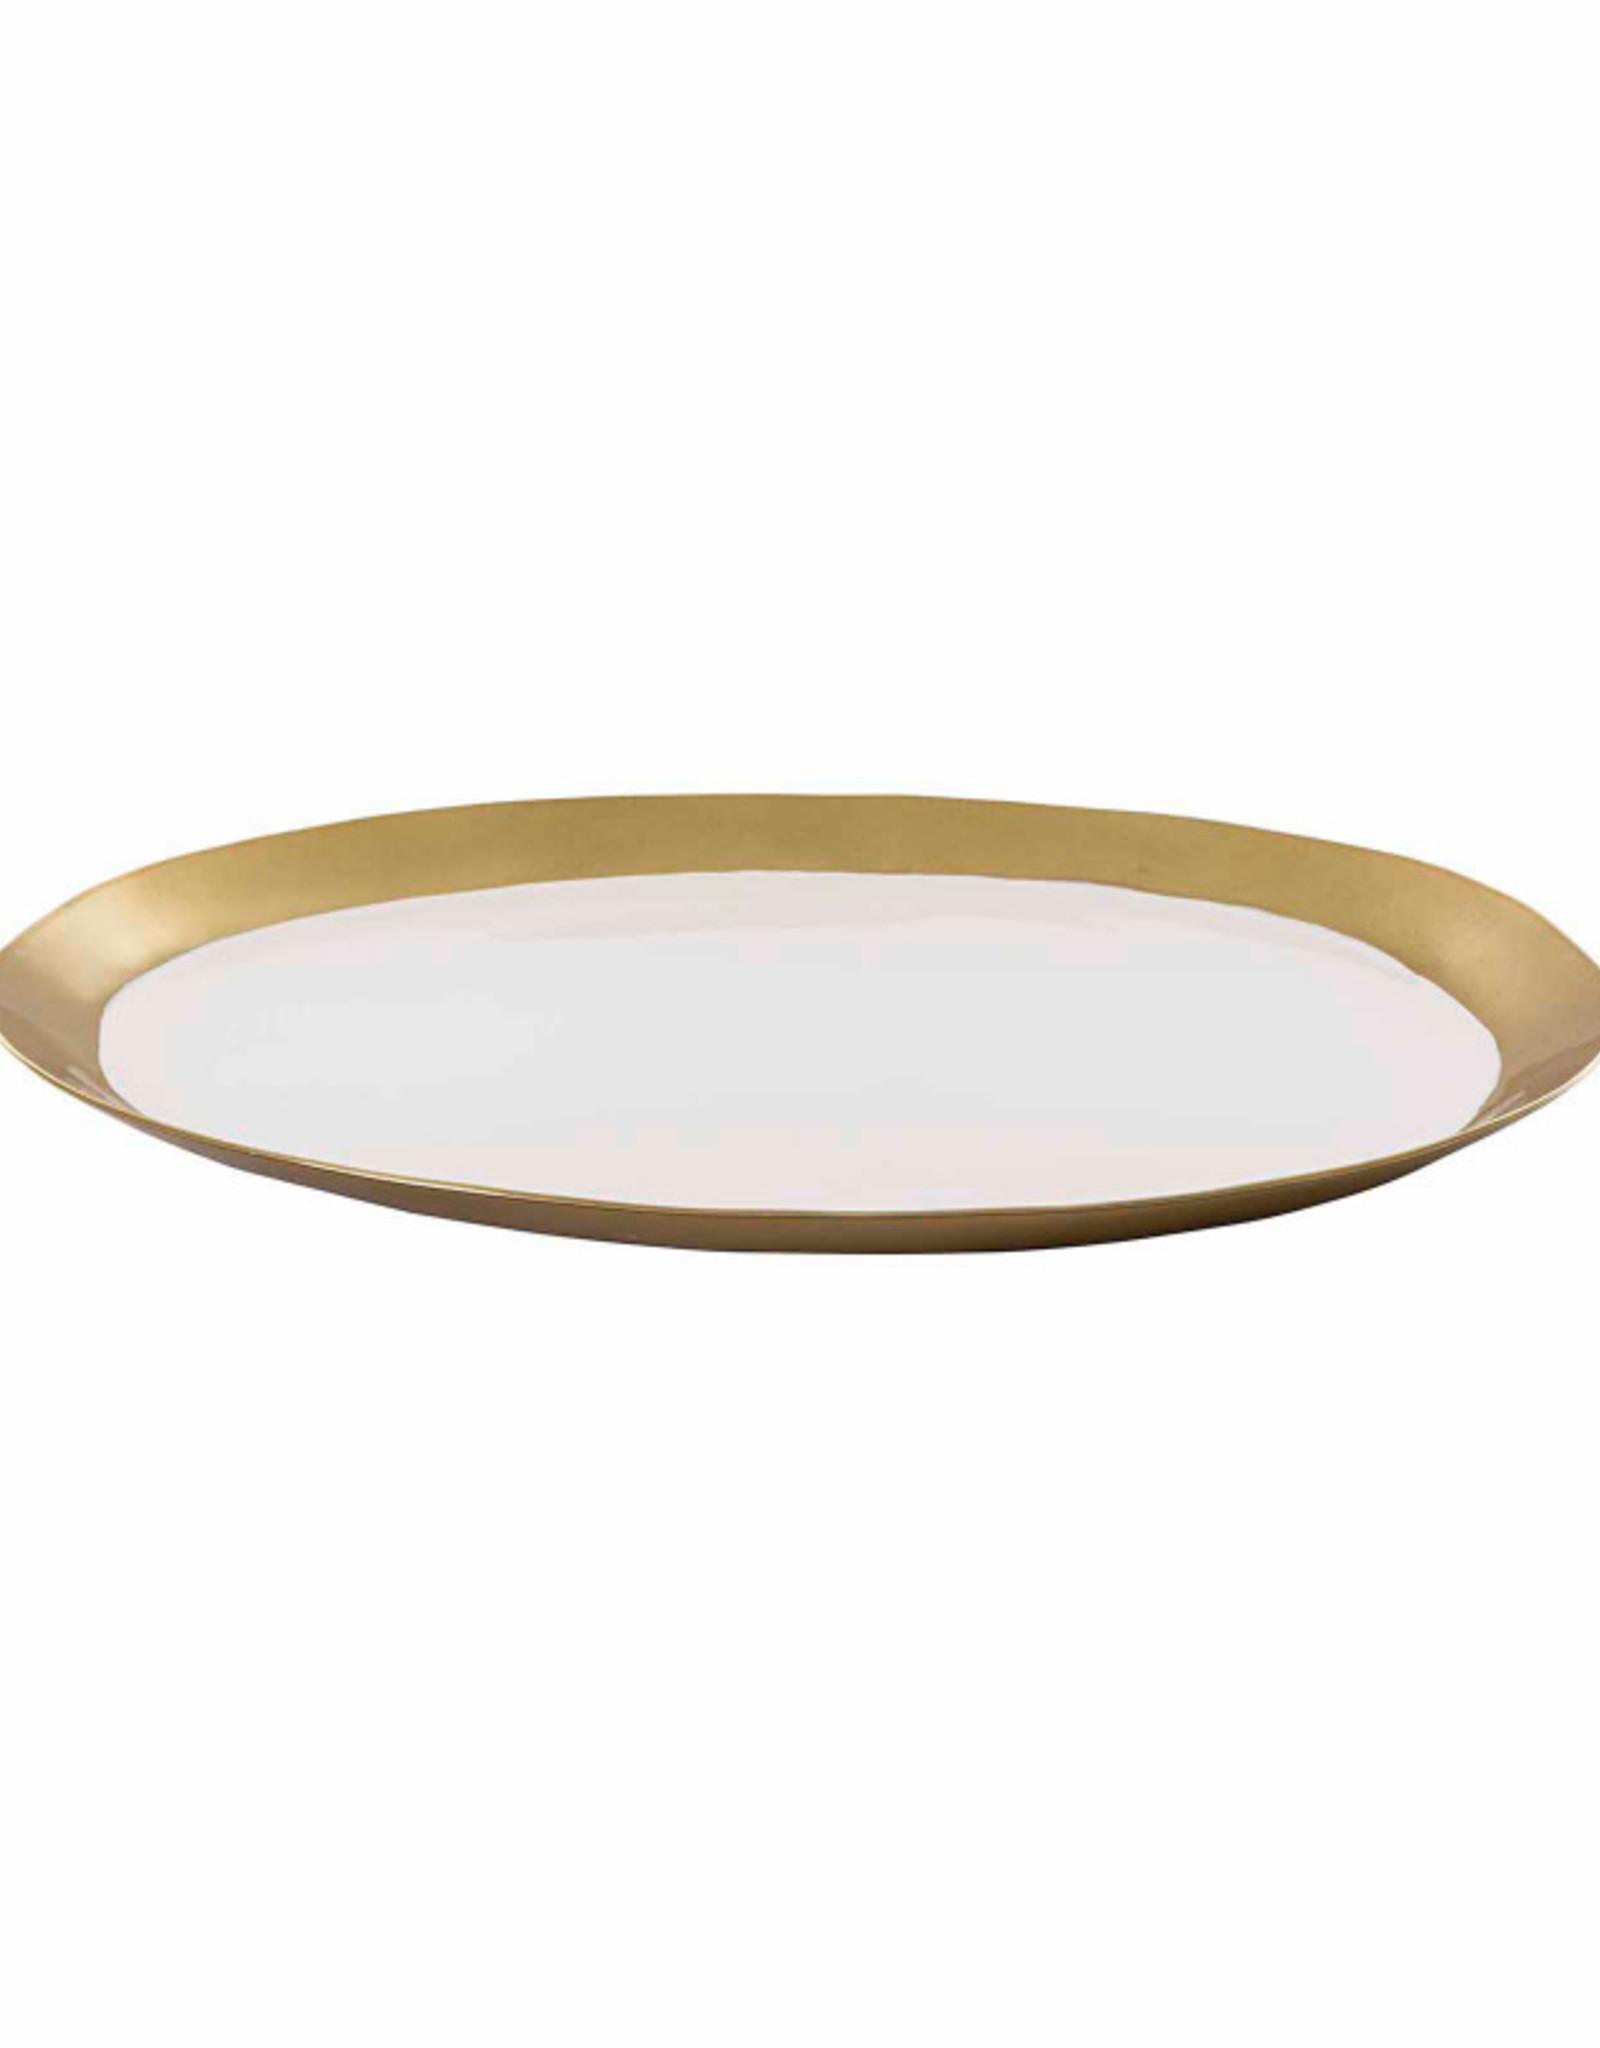 Horgans White Enamel Round Tray with Gold